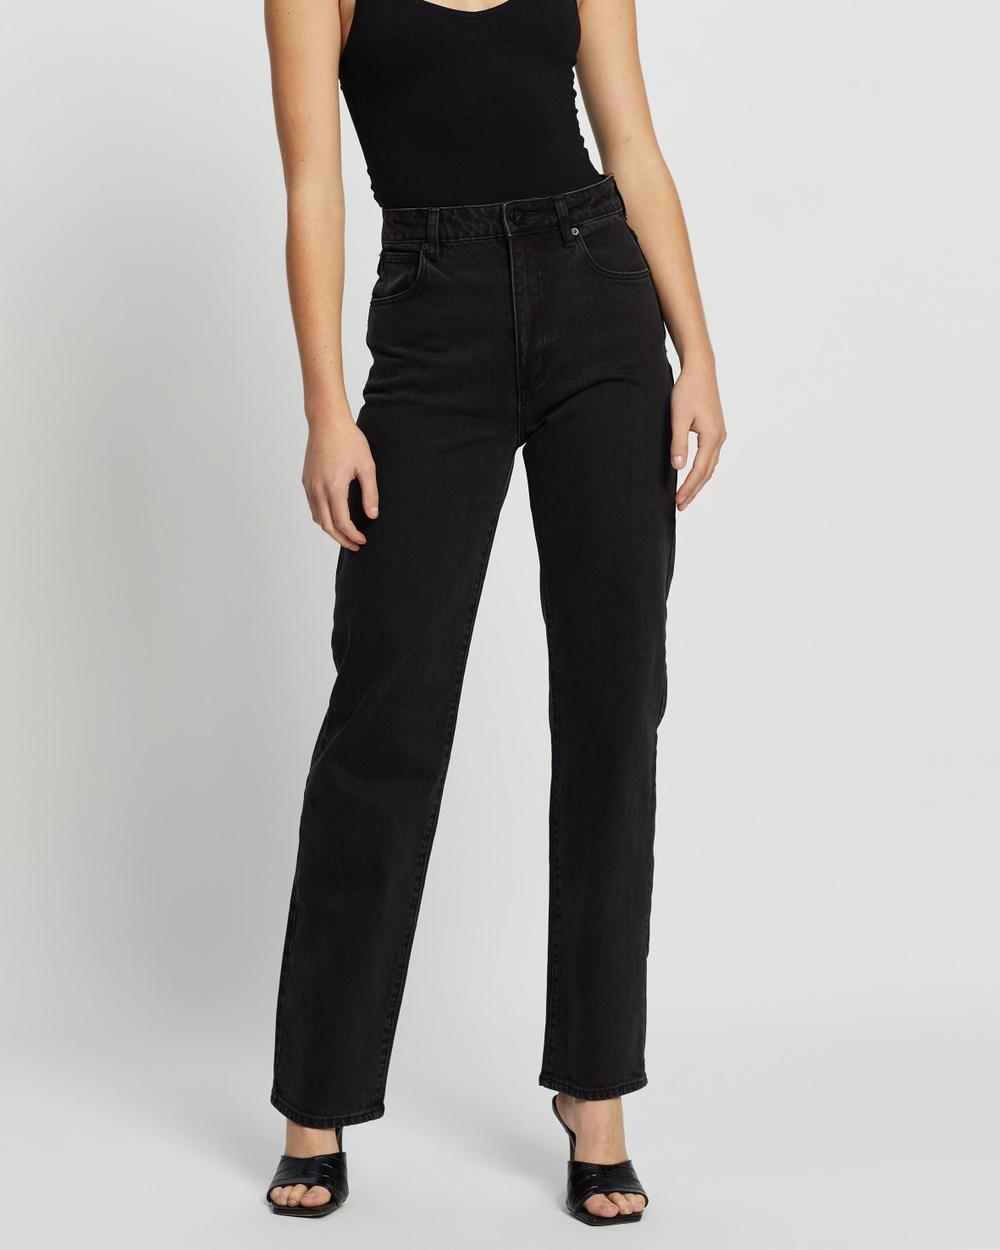 Abrand A '94 High Straight Jeans High-Waisted Teri